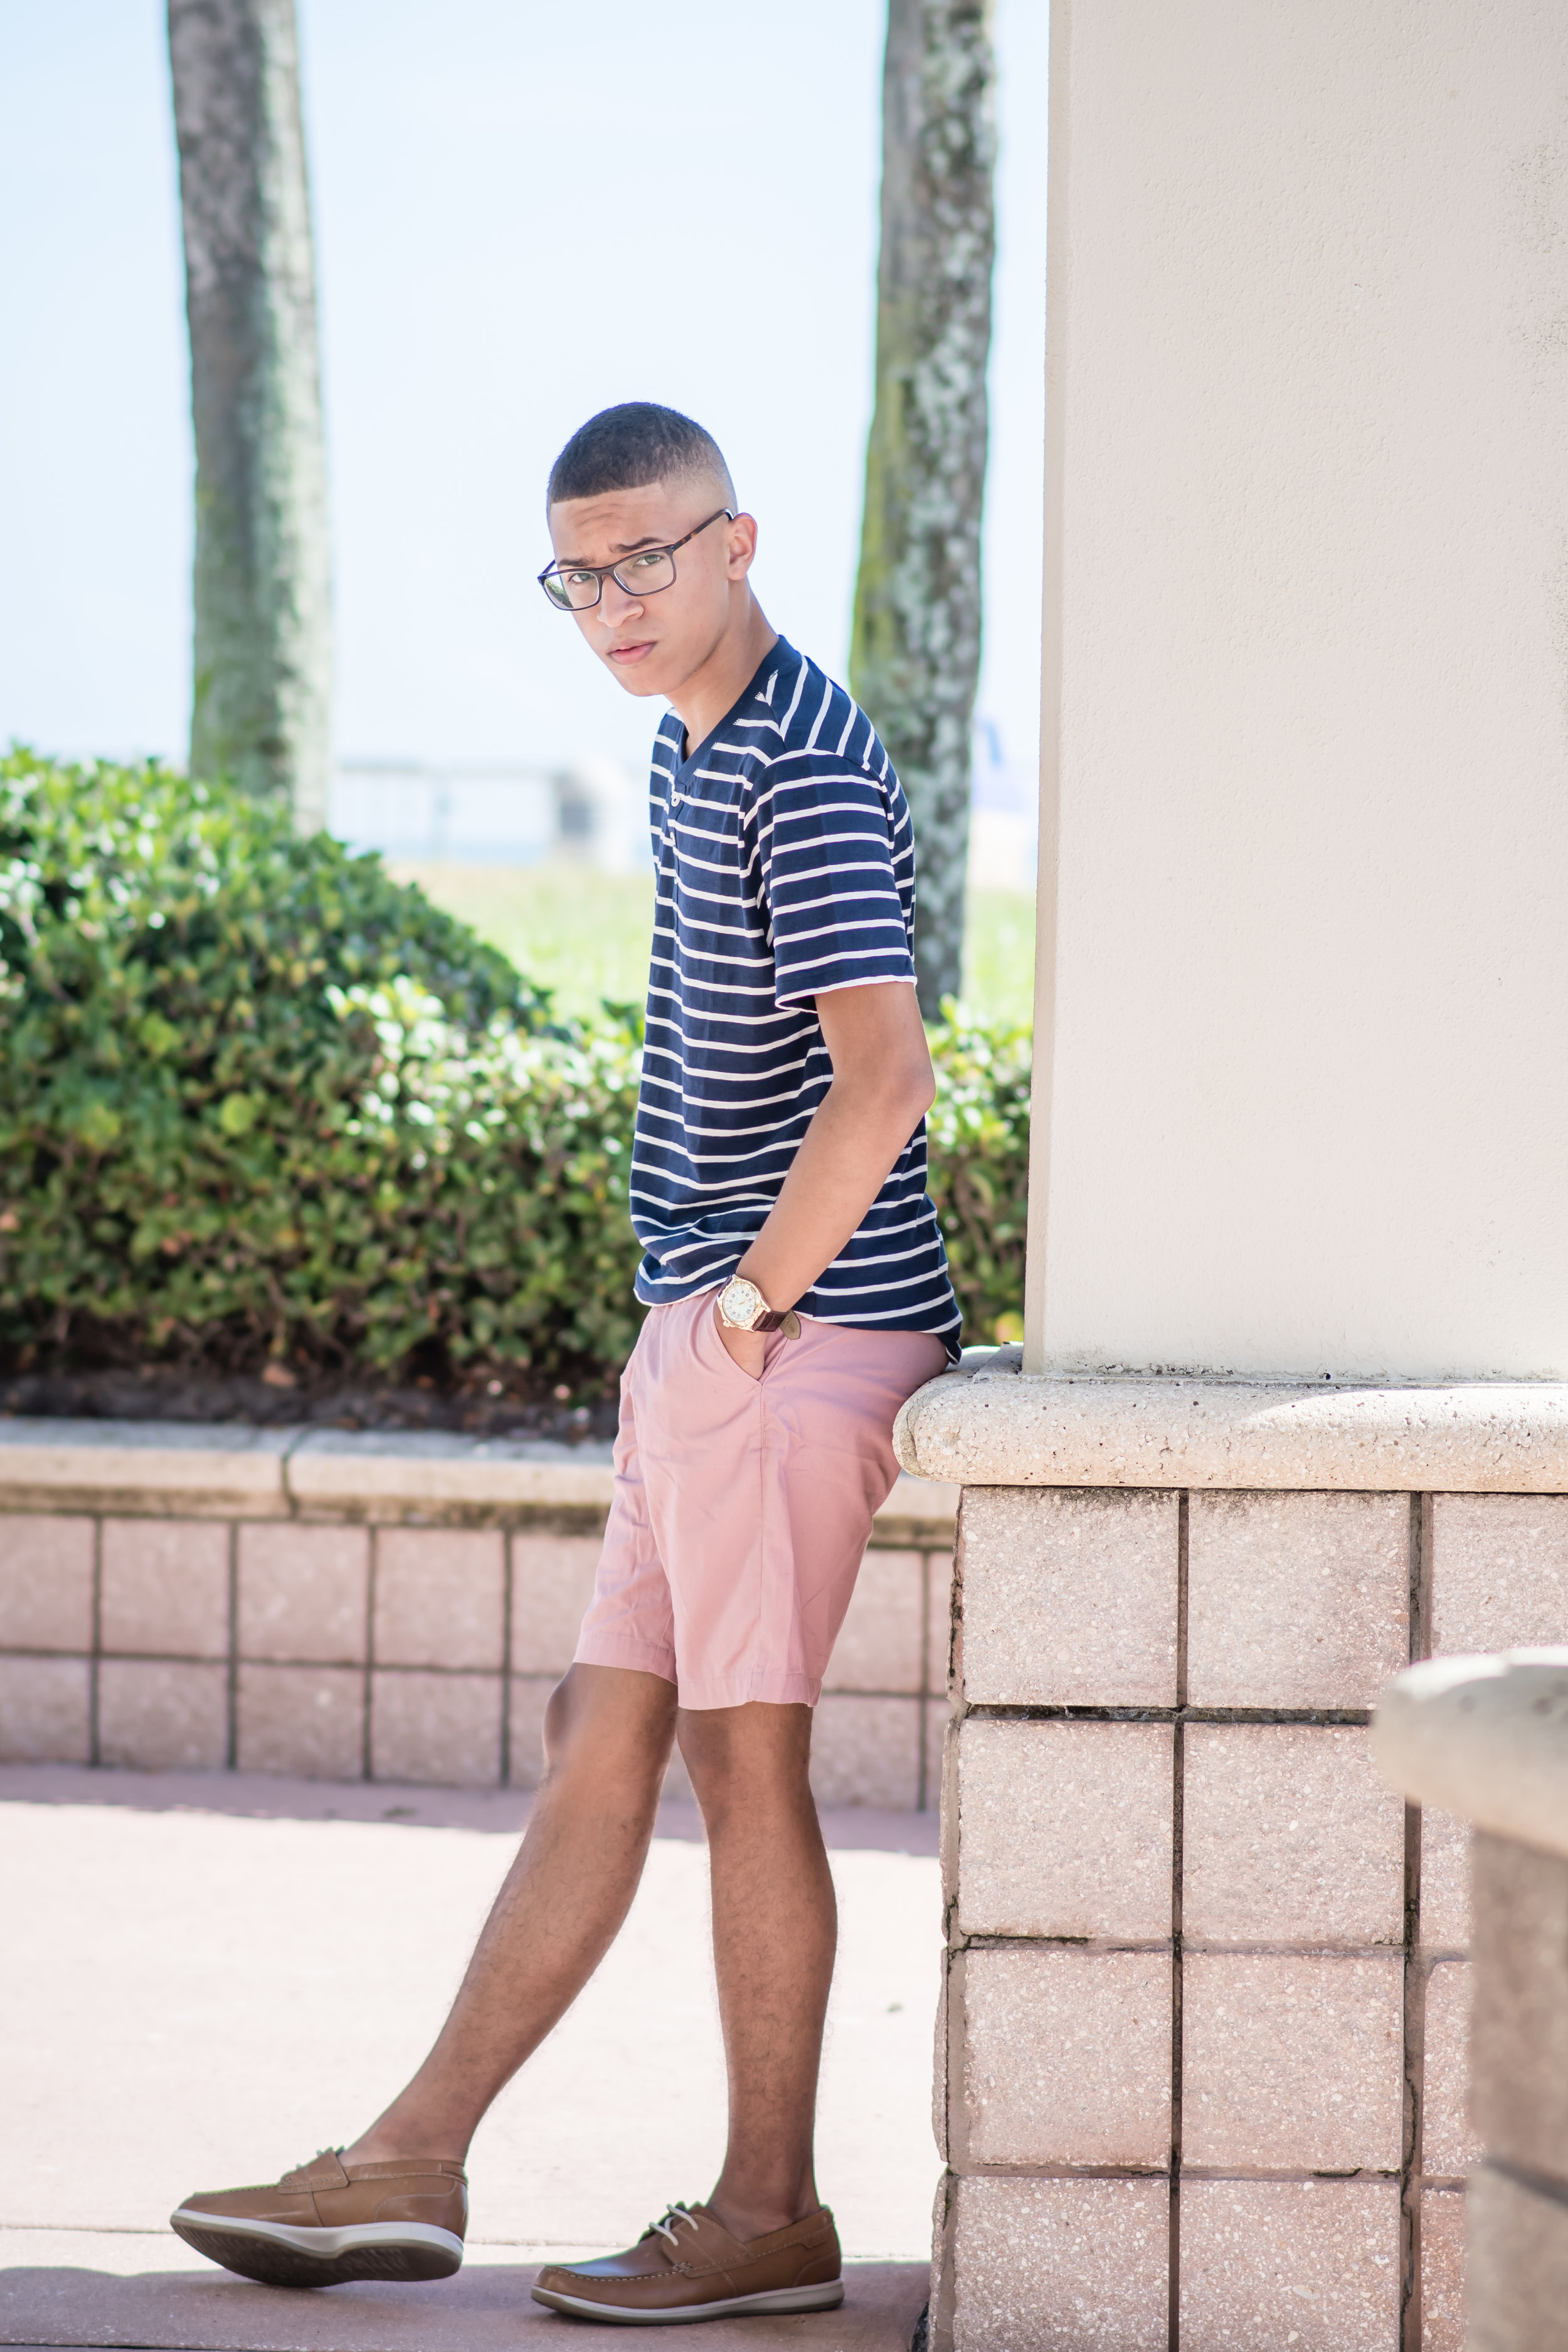 daytona-beach-men-fashion-photos-orlando-photographer-yanitza-ninett-5.jpg